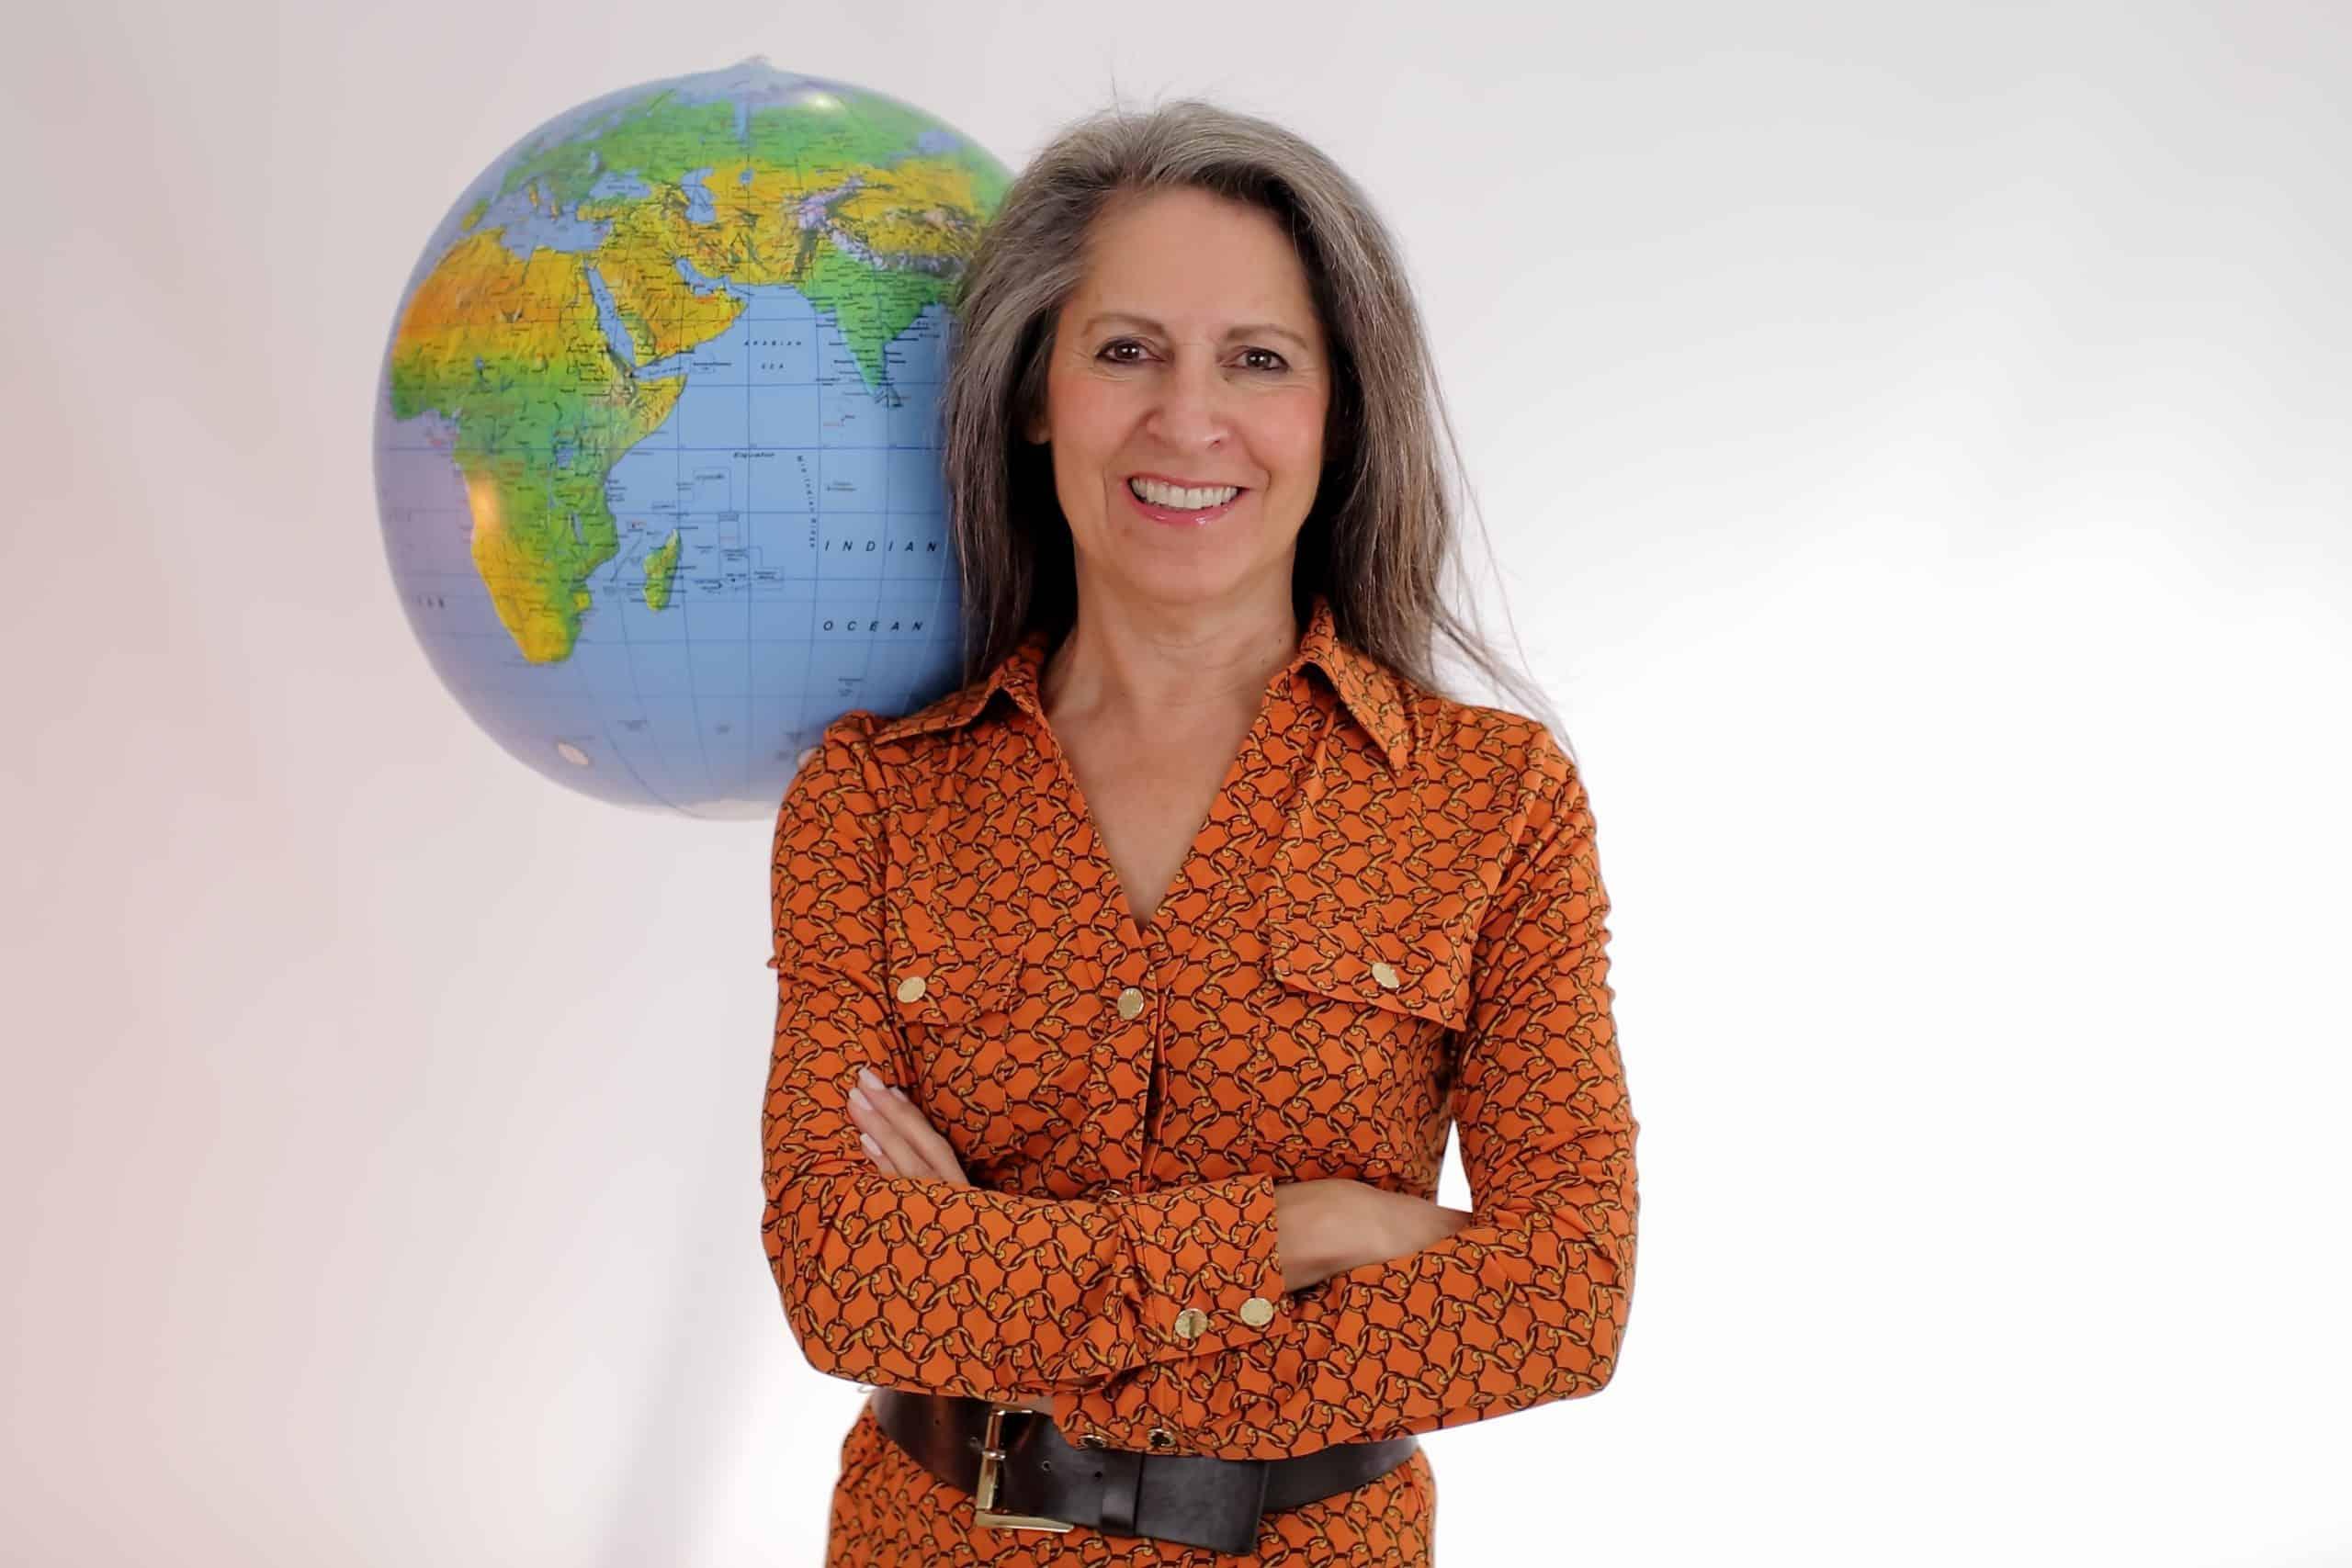 Nancy Silberkleit, co-CEO of Archie Comics